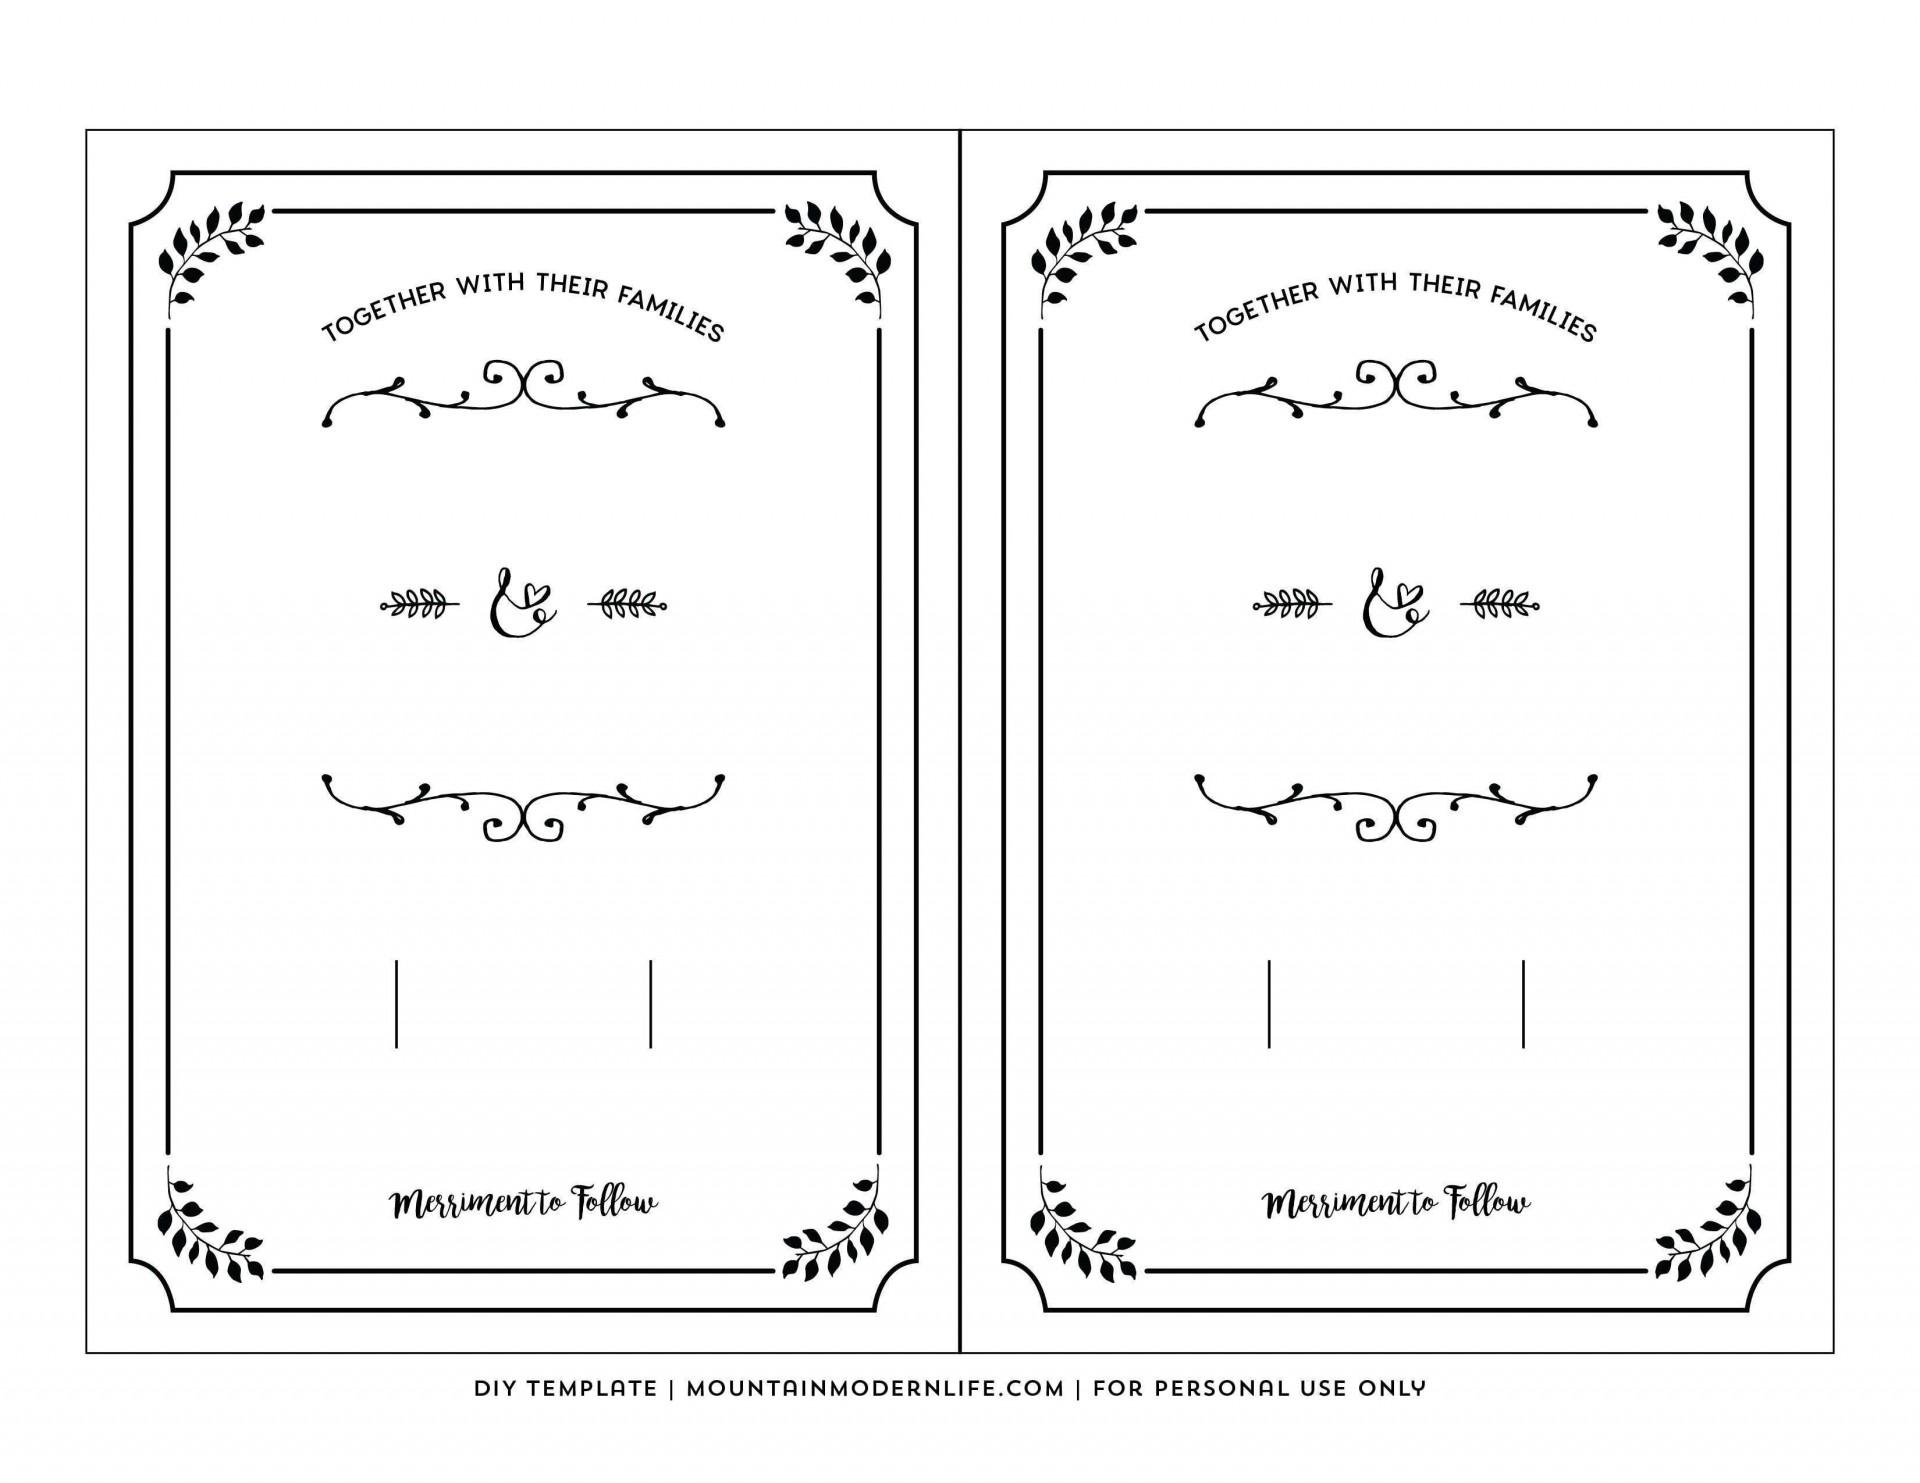 003 Stirring Invitation Template Free Printable Concept  Editable Christma Party Dinner Retirement1920